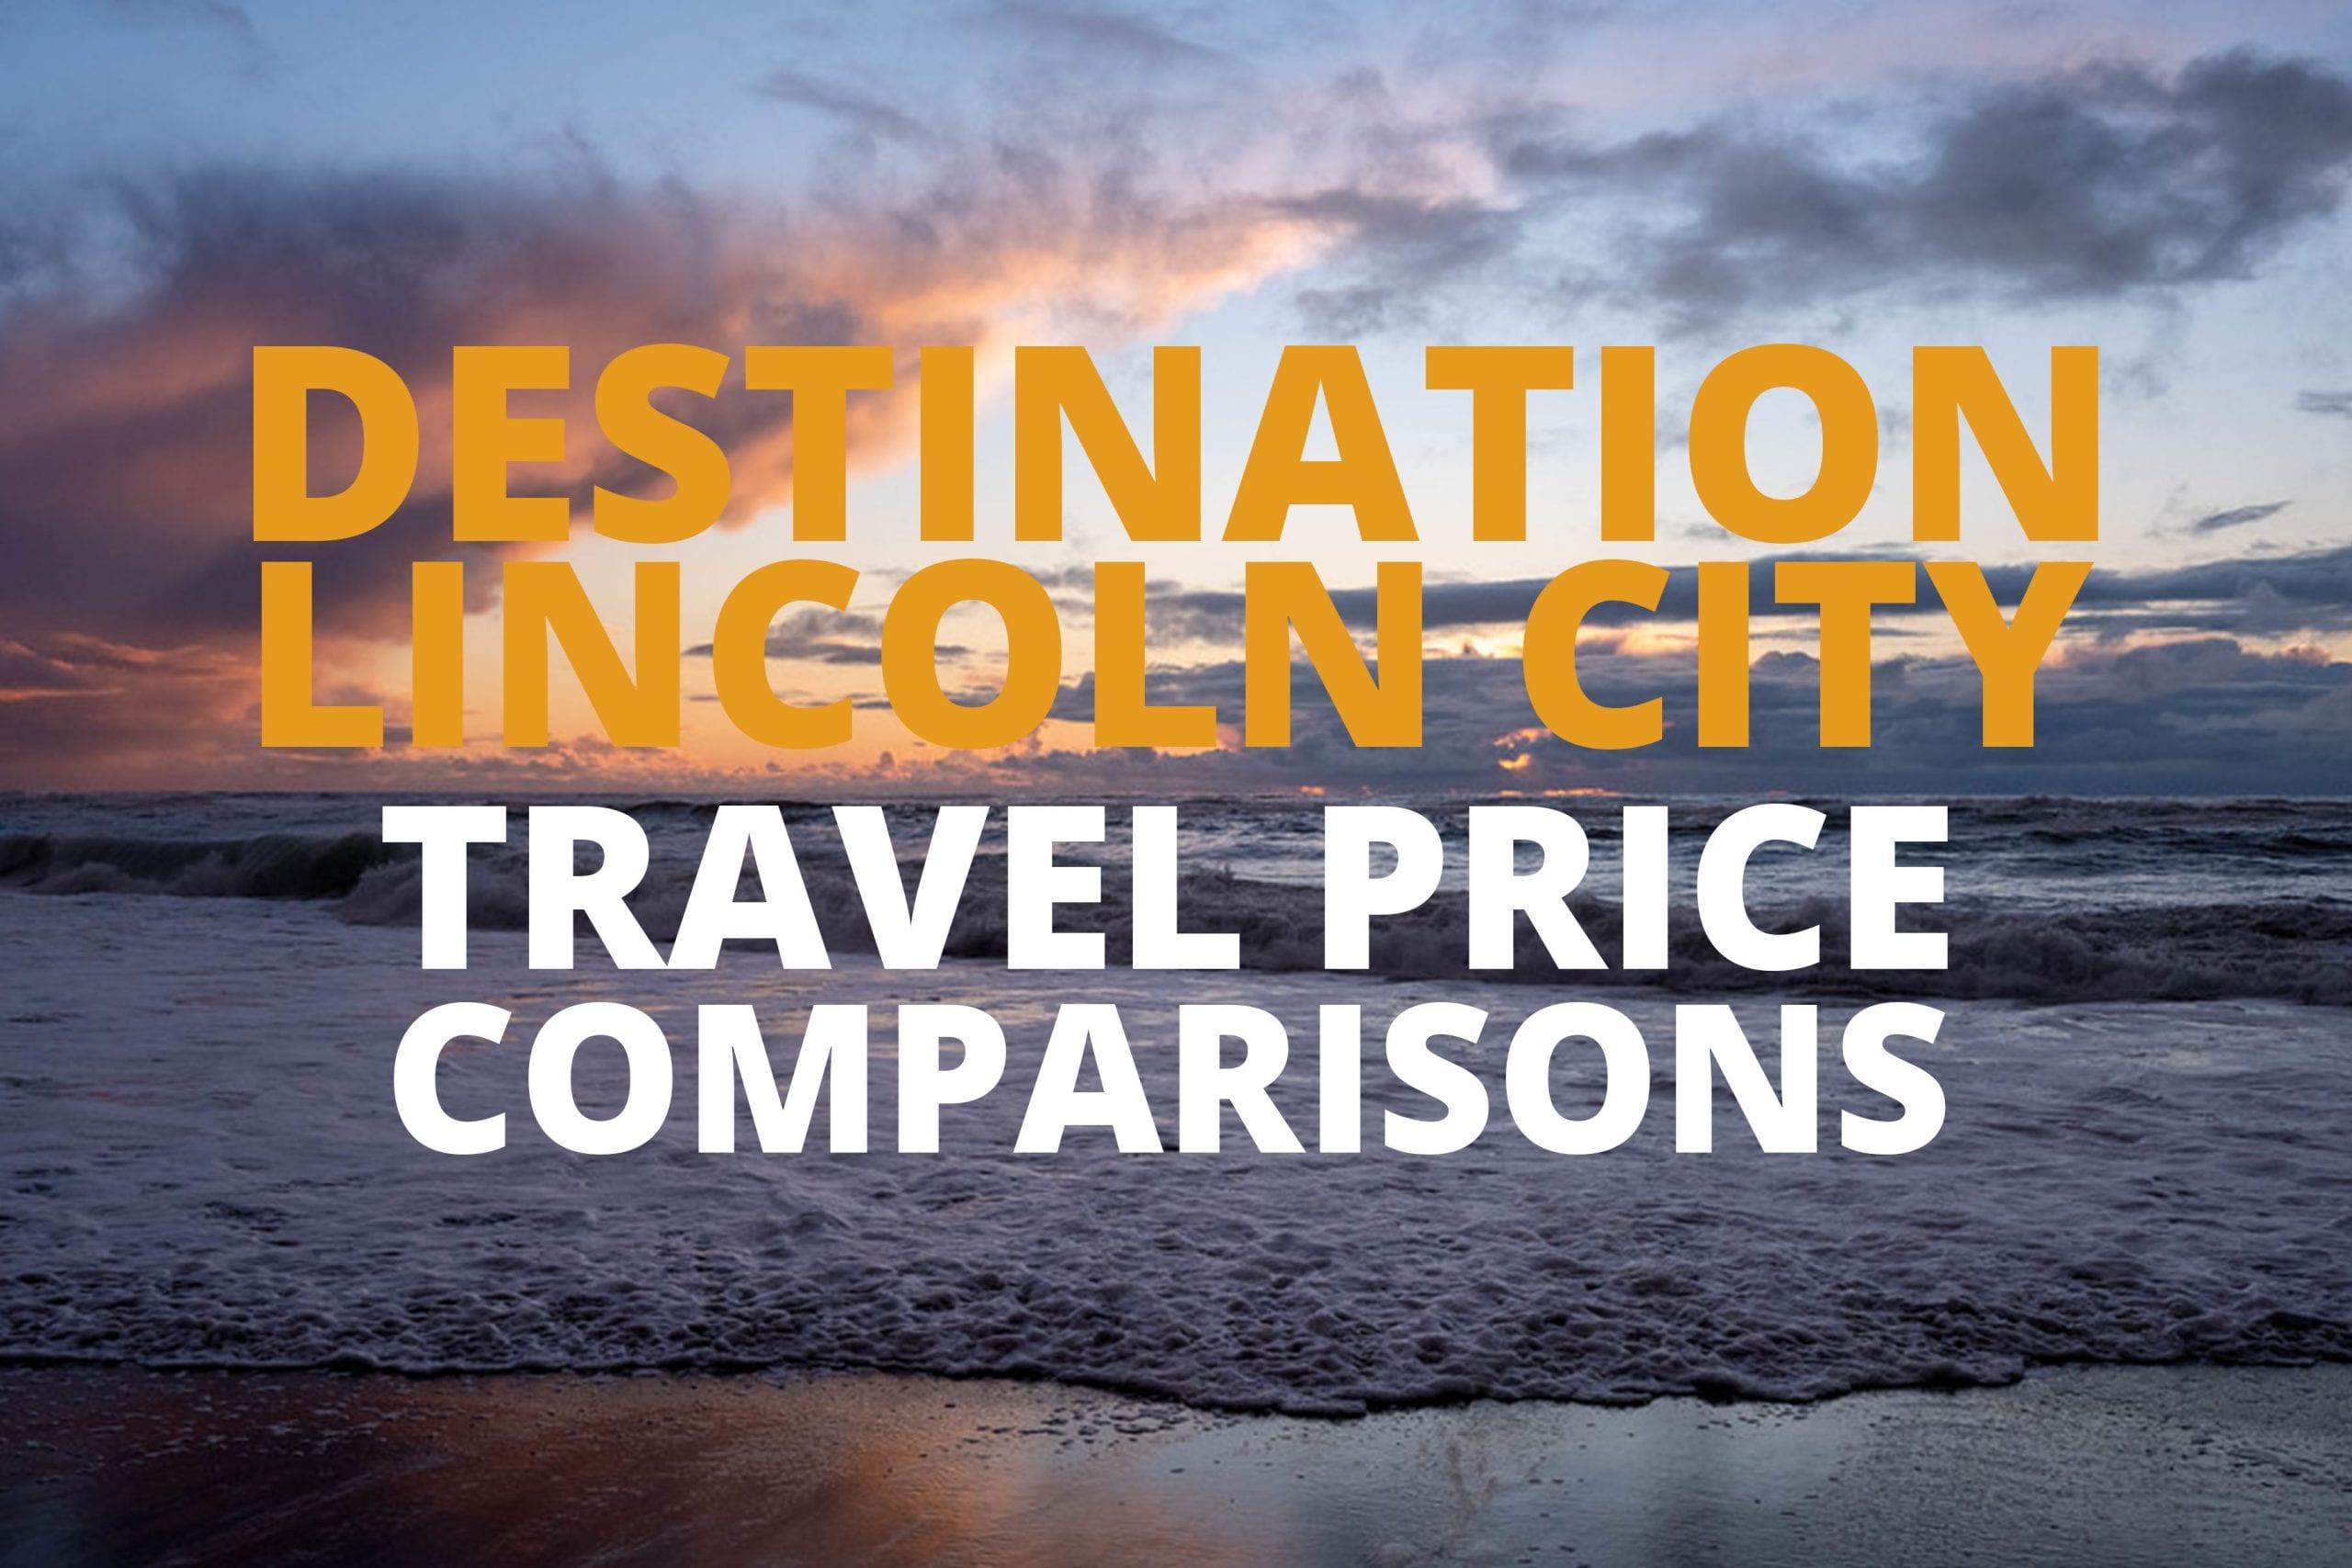 Lincoln City Oregon Travel Prices